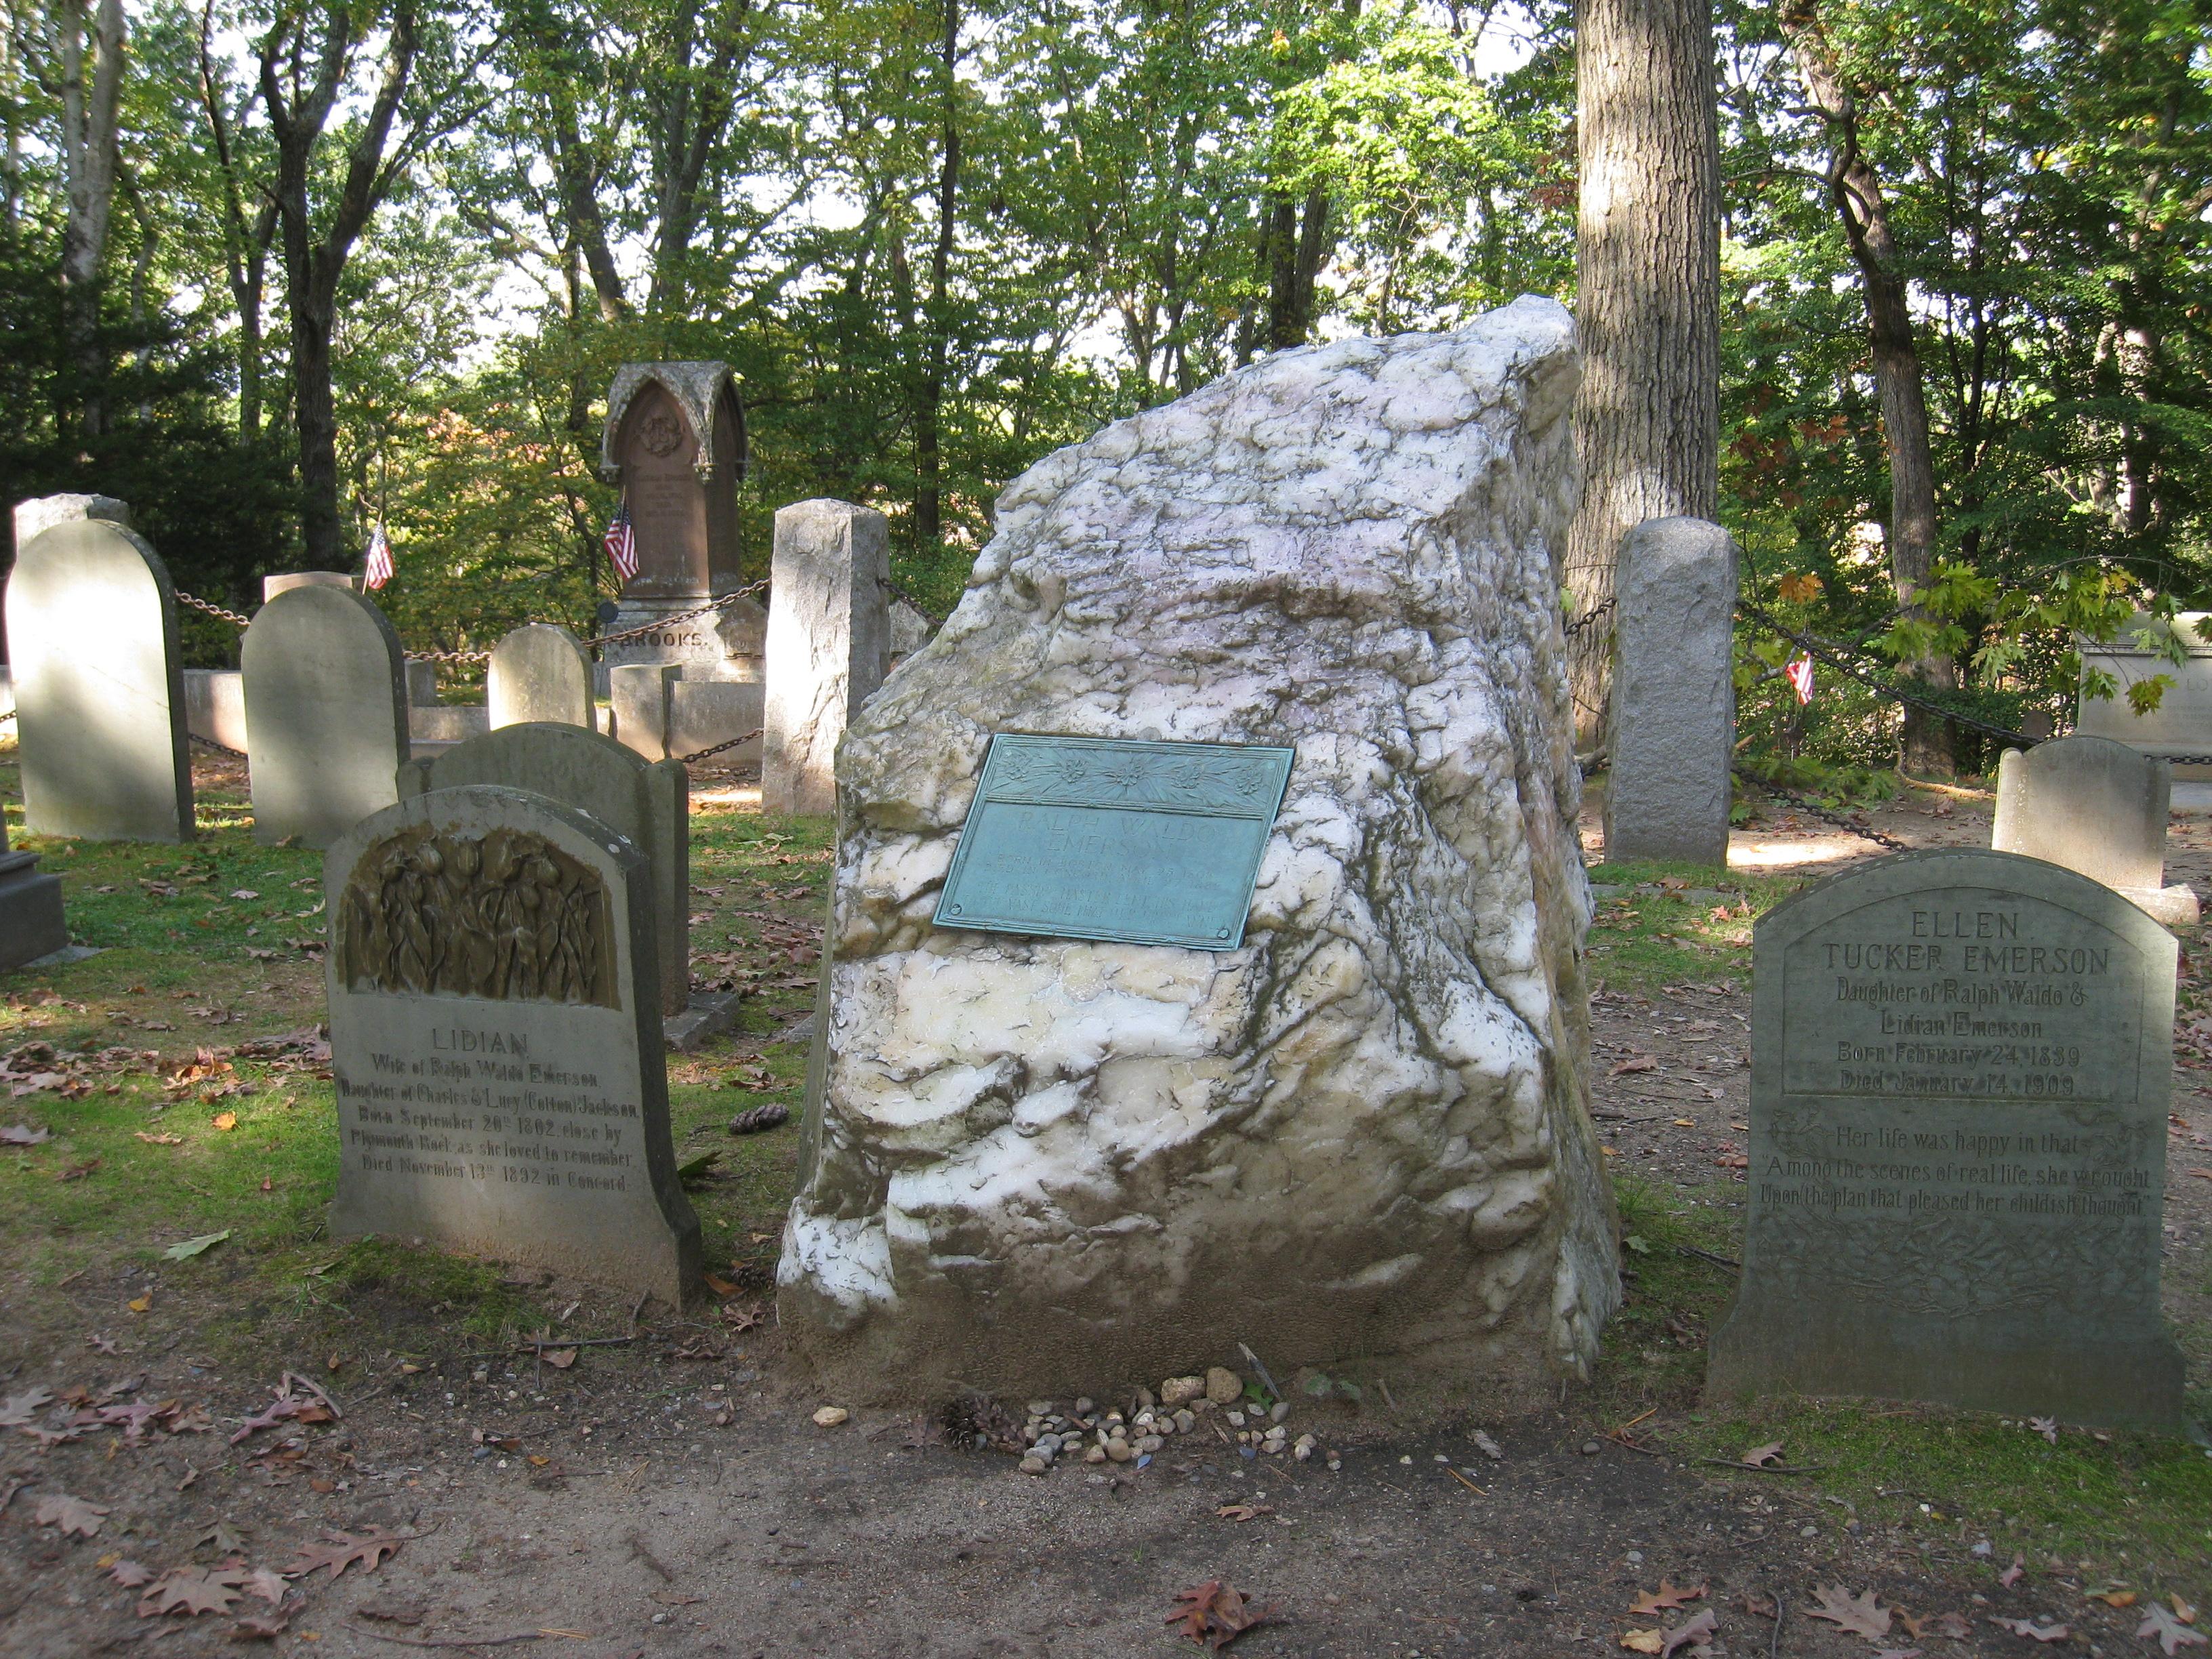 Ralph Waldo Emerson - Sleepy Hollow Cemetery - Concord, Mass.